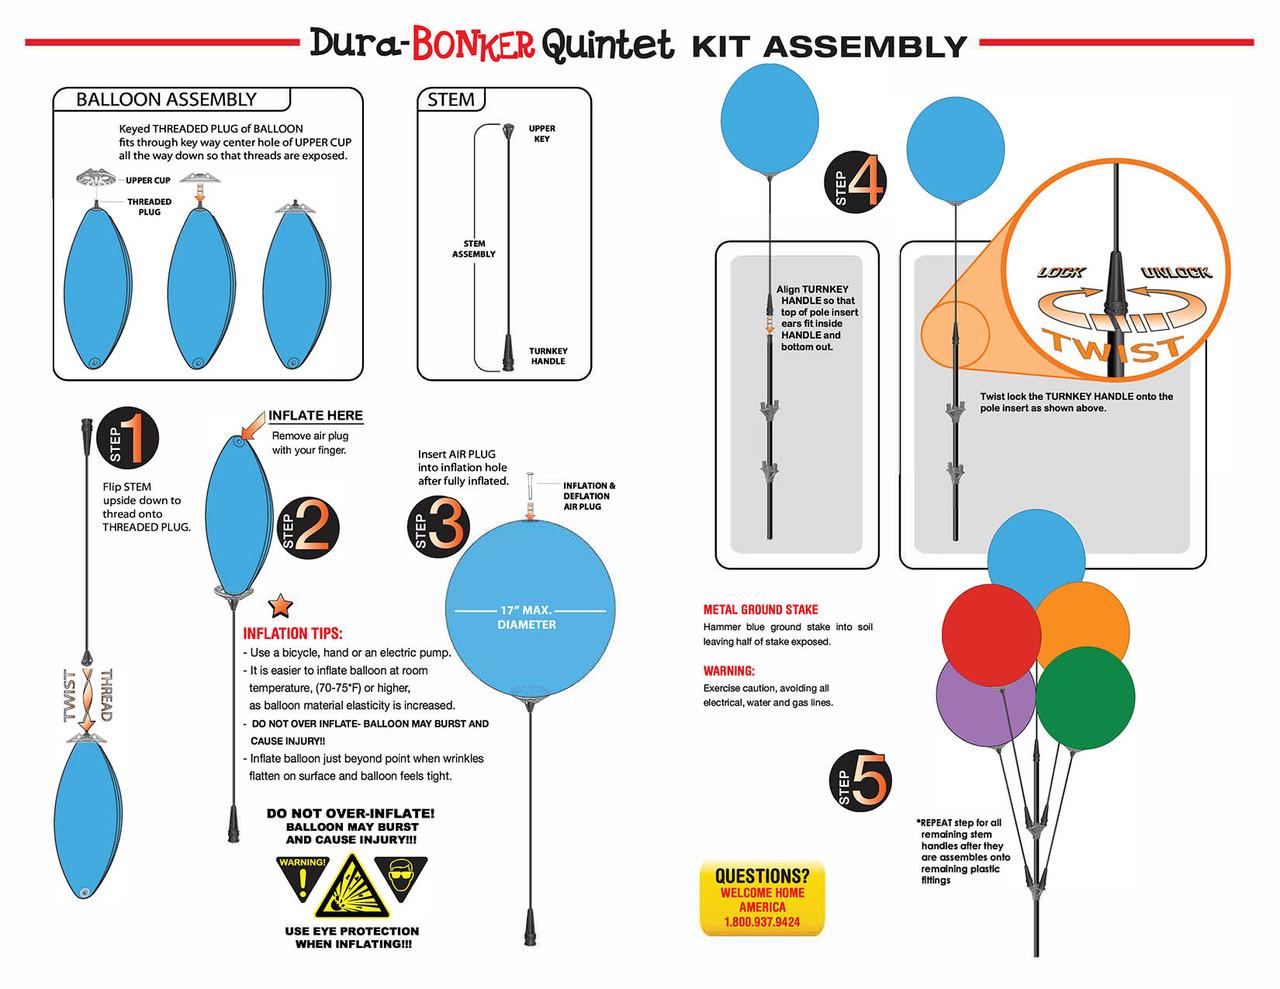 Dura-Bonker Single Kit - ITEM#: DBS05